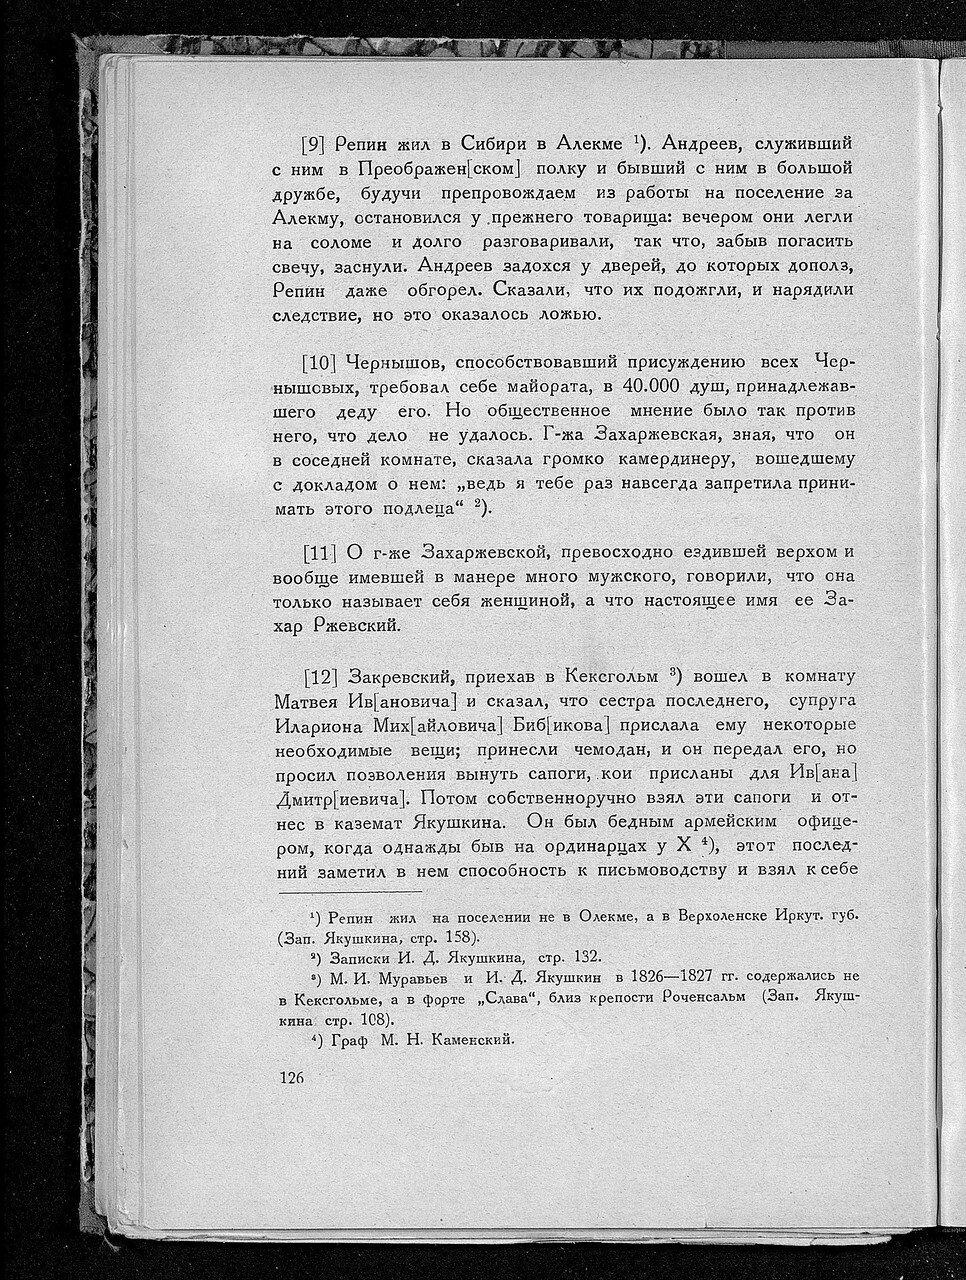 https://img-fotki.yandex.ru/get/478910/199368979.a2/0_214378_5d5e573c_XXXL.jpg